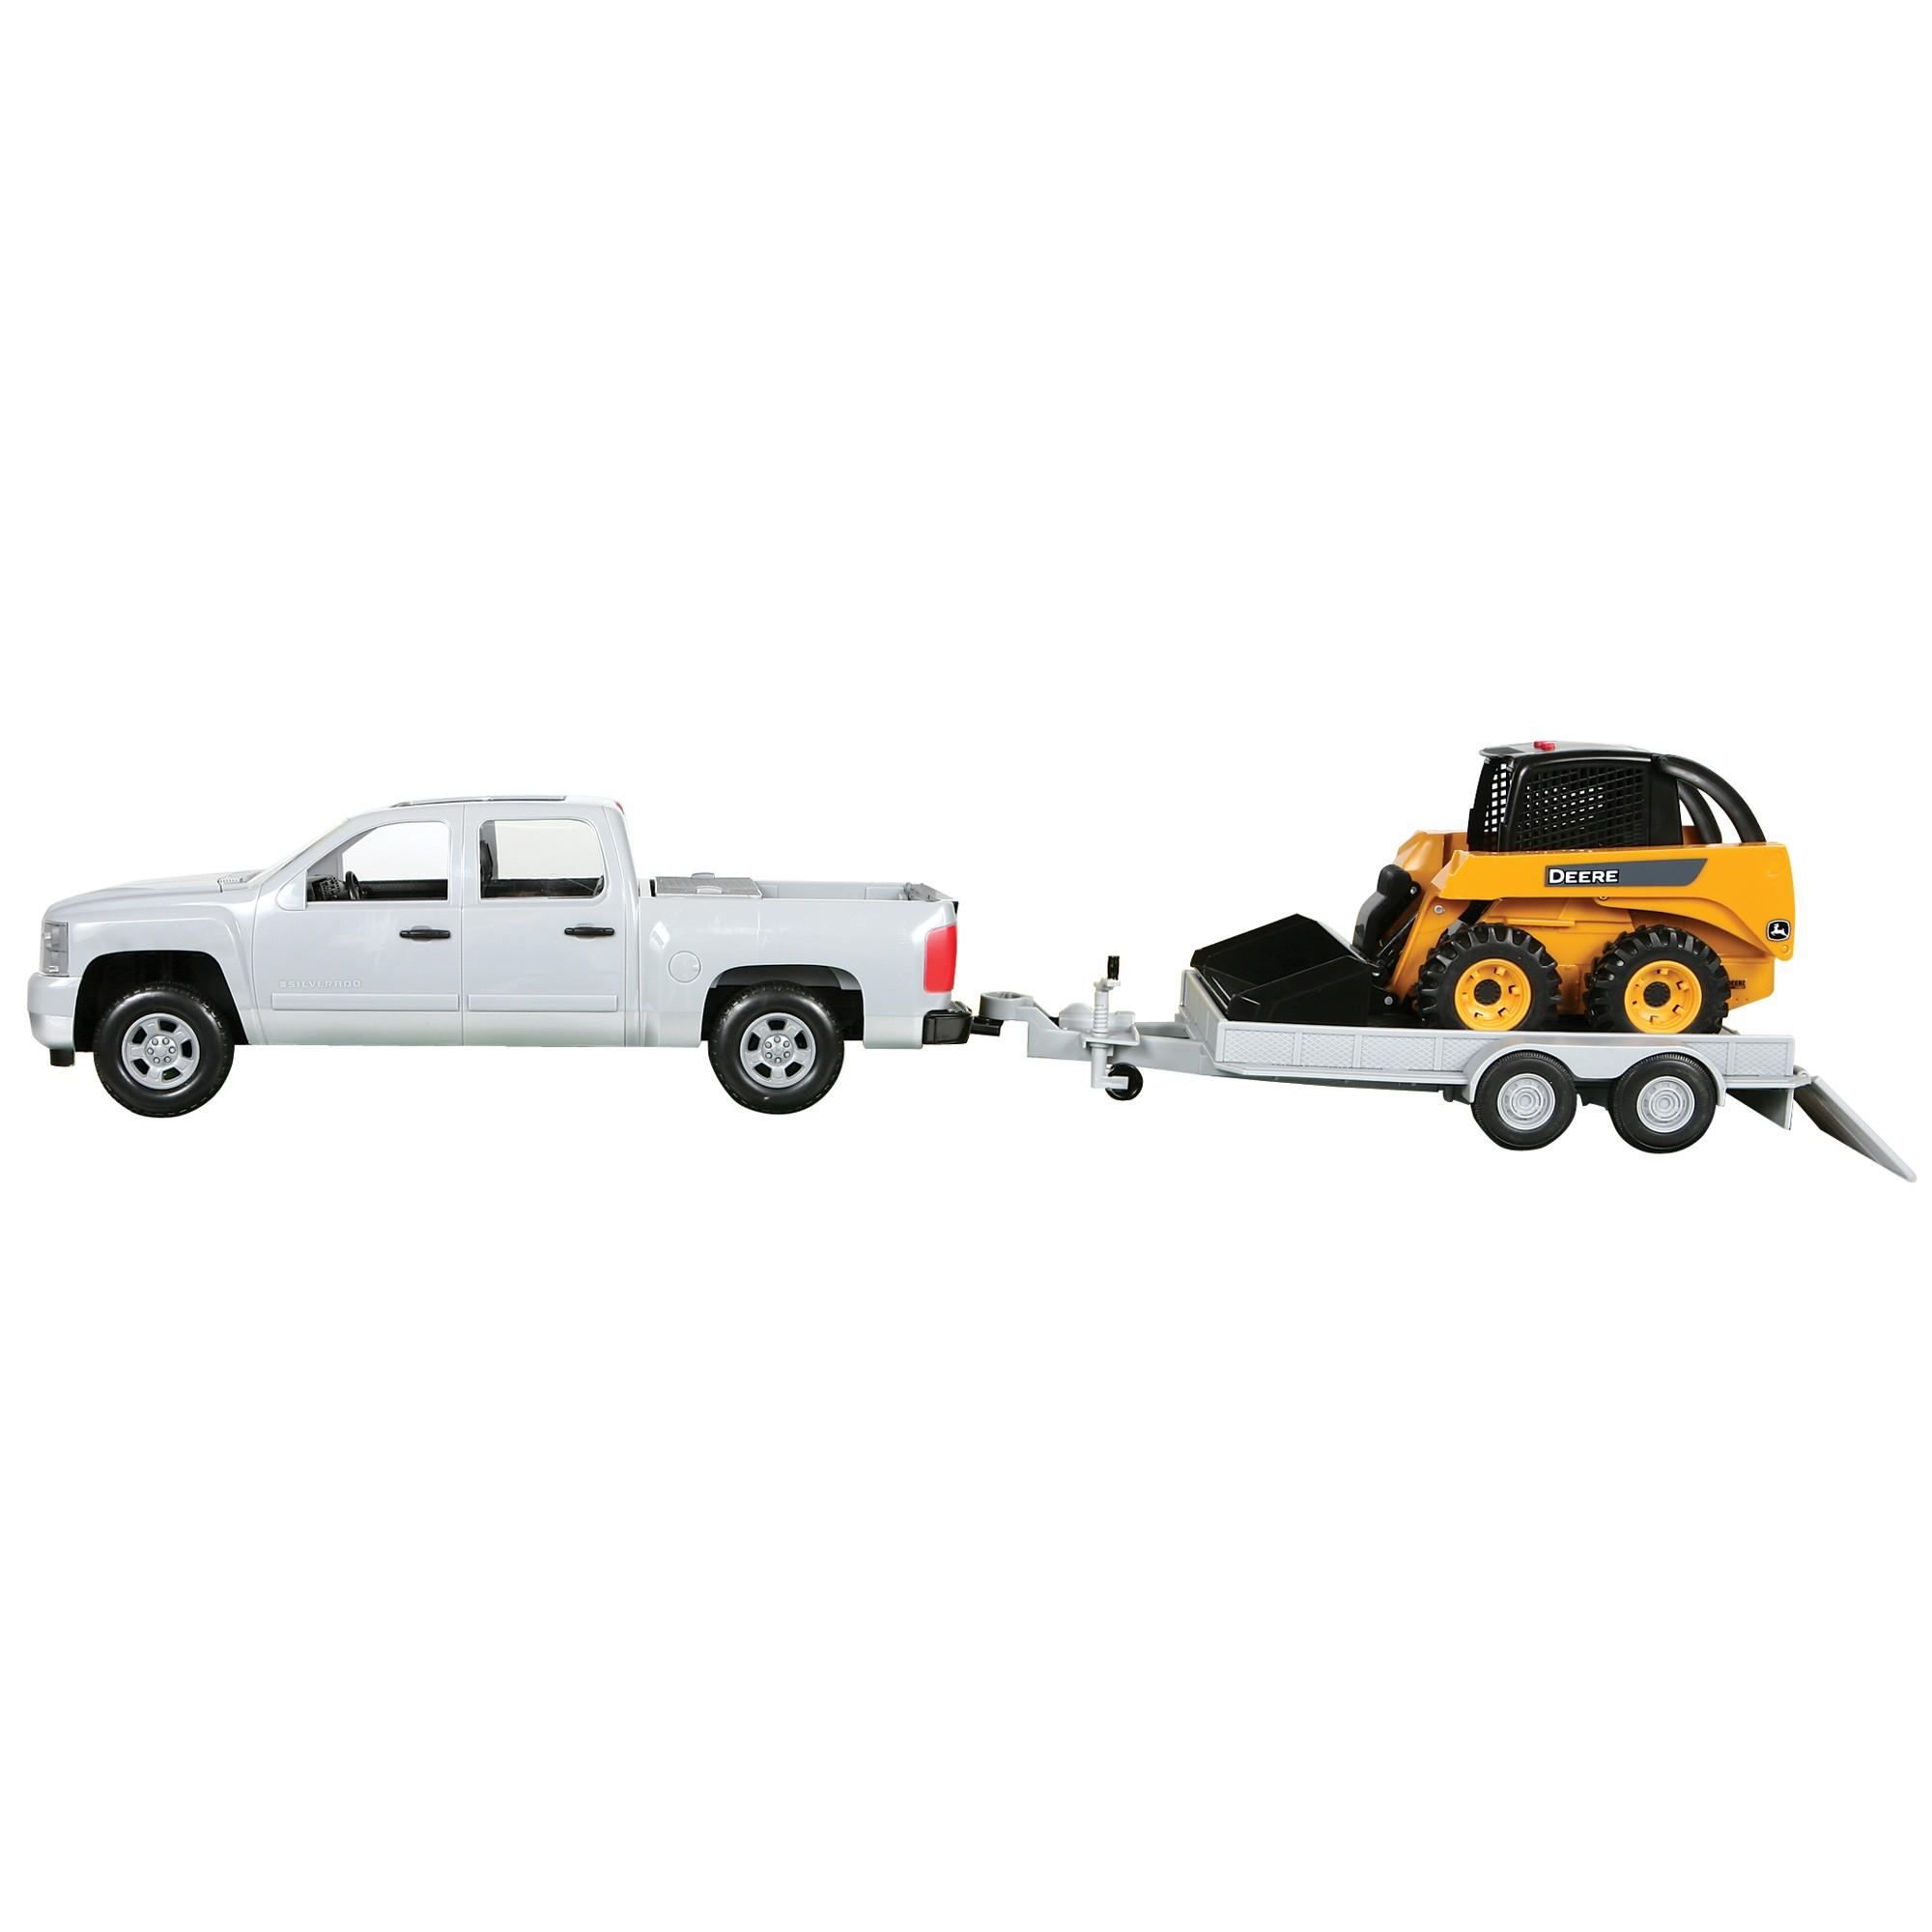 16 Big Farm Truck, Skidsteer & Trailer Set | QC Supply